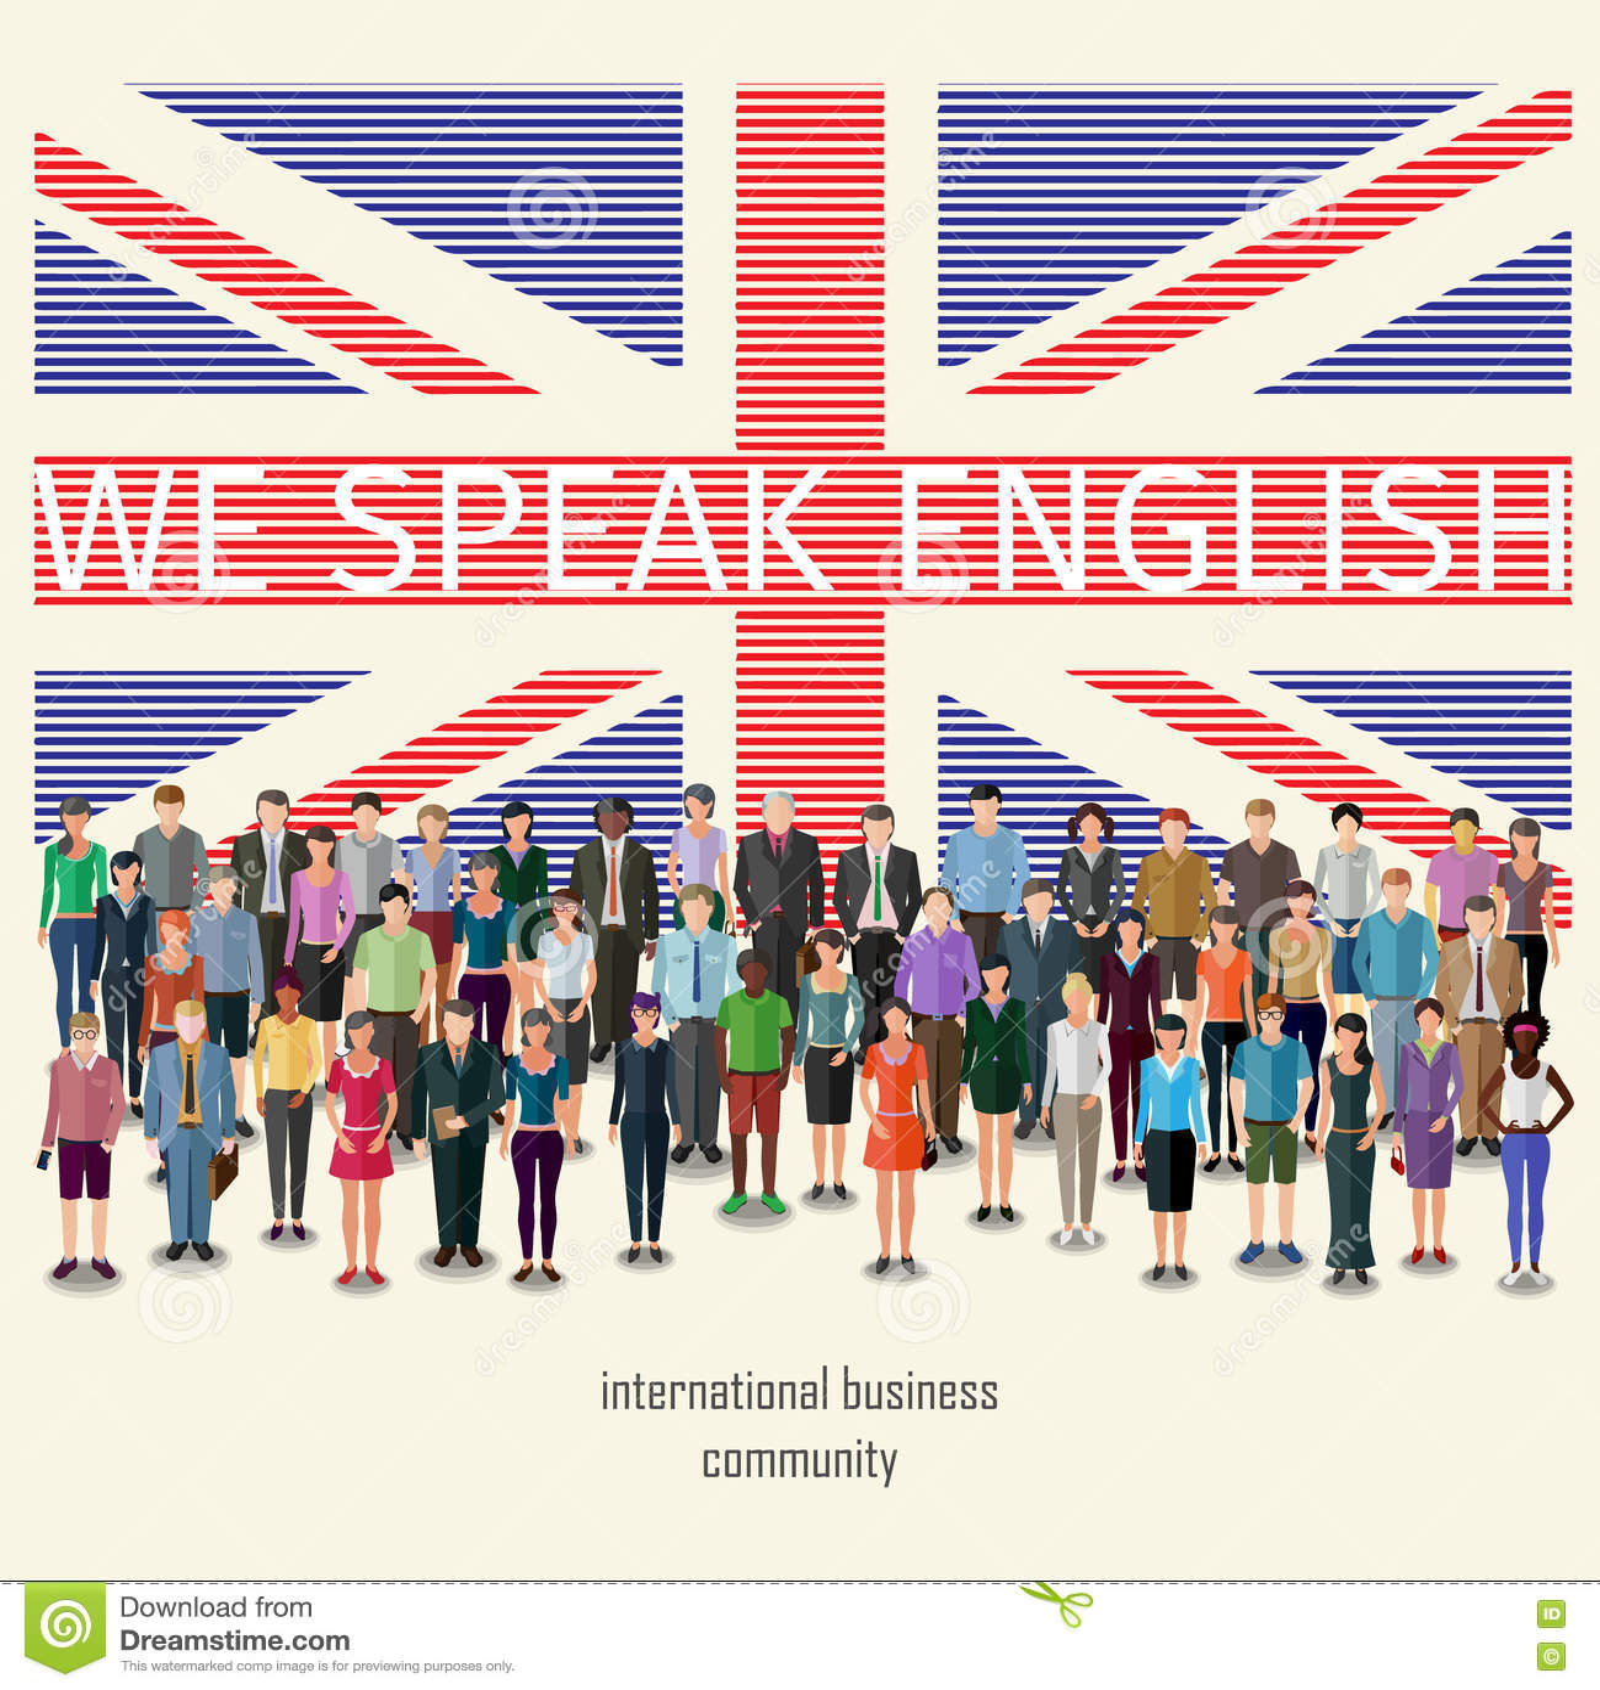 Let Speak Foreign Languages Stock Vector - Illustration of